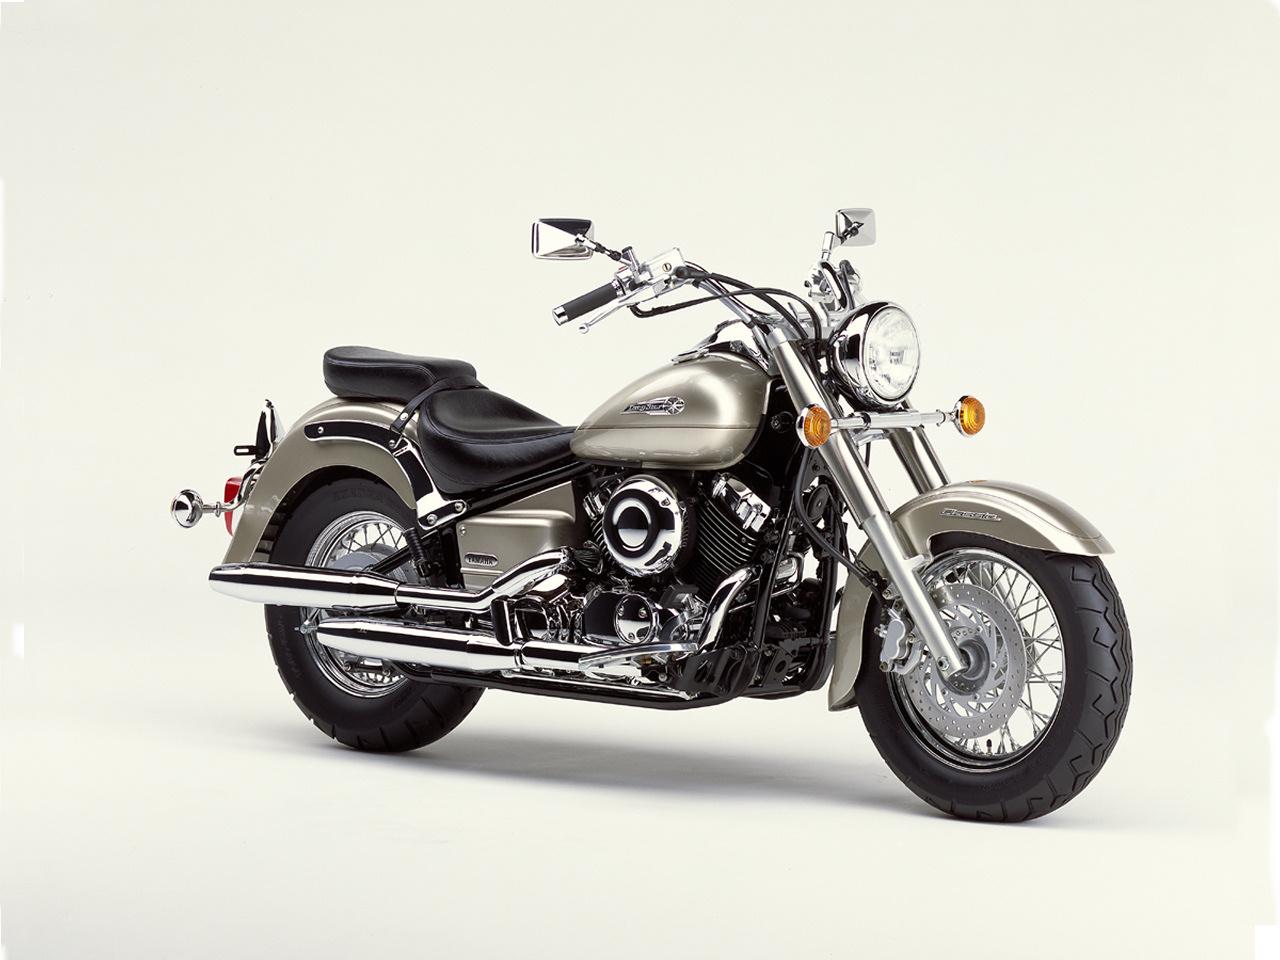 Yamaha Drag Star 650 (XVS 650)